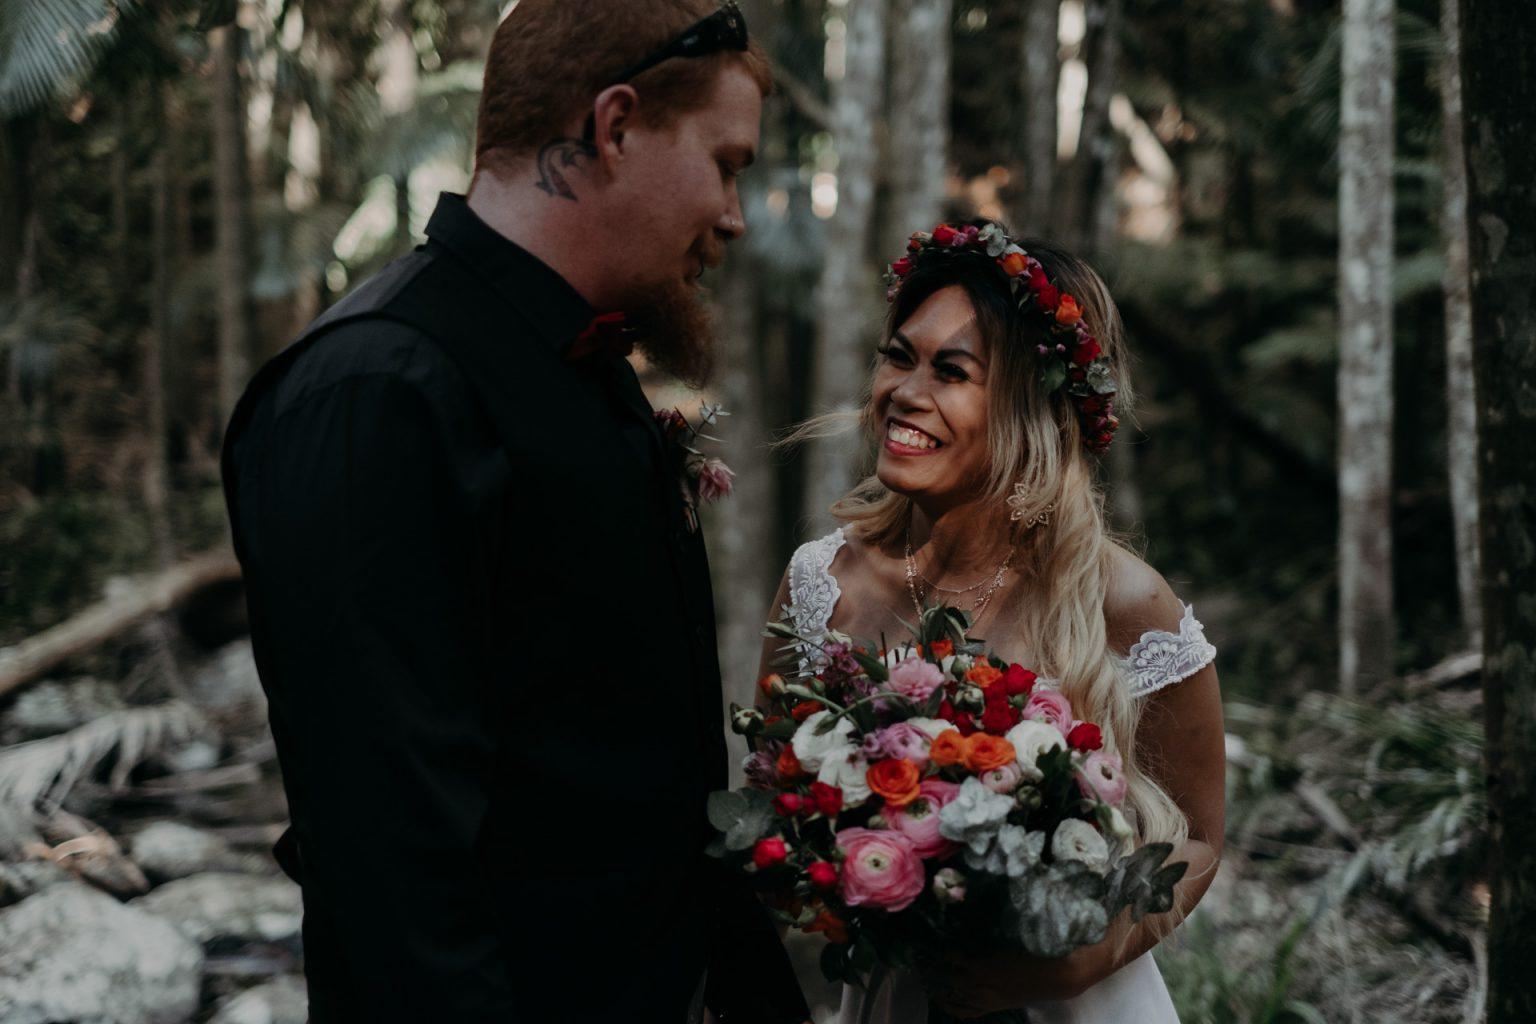 bride and groom eloping in forest mt tamborine